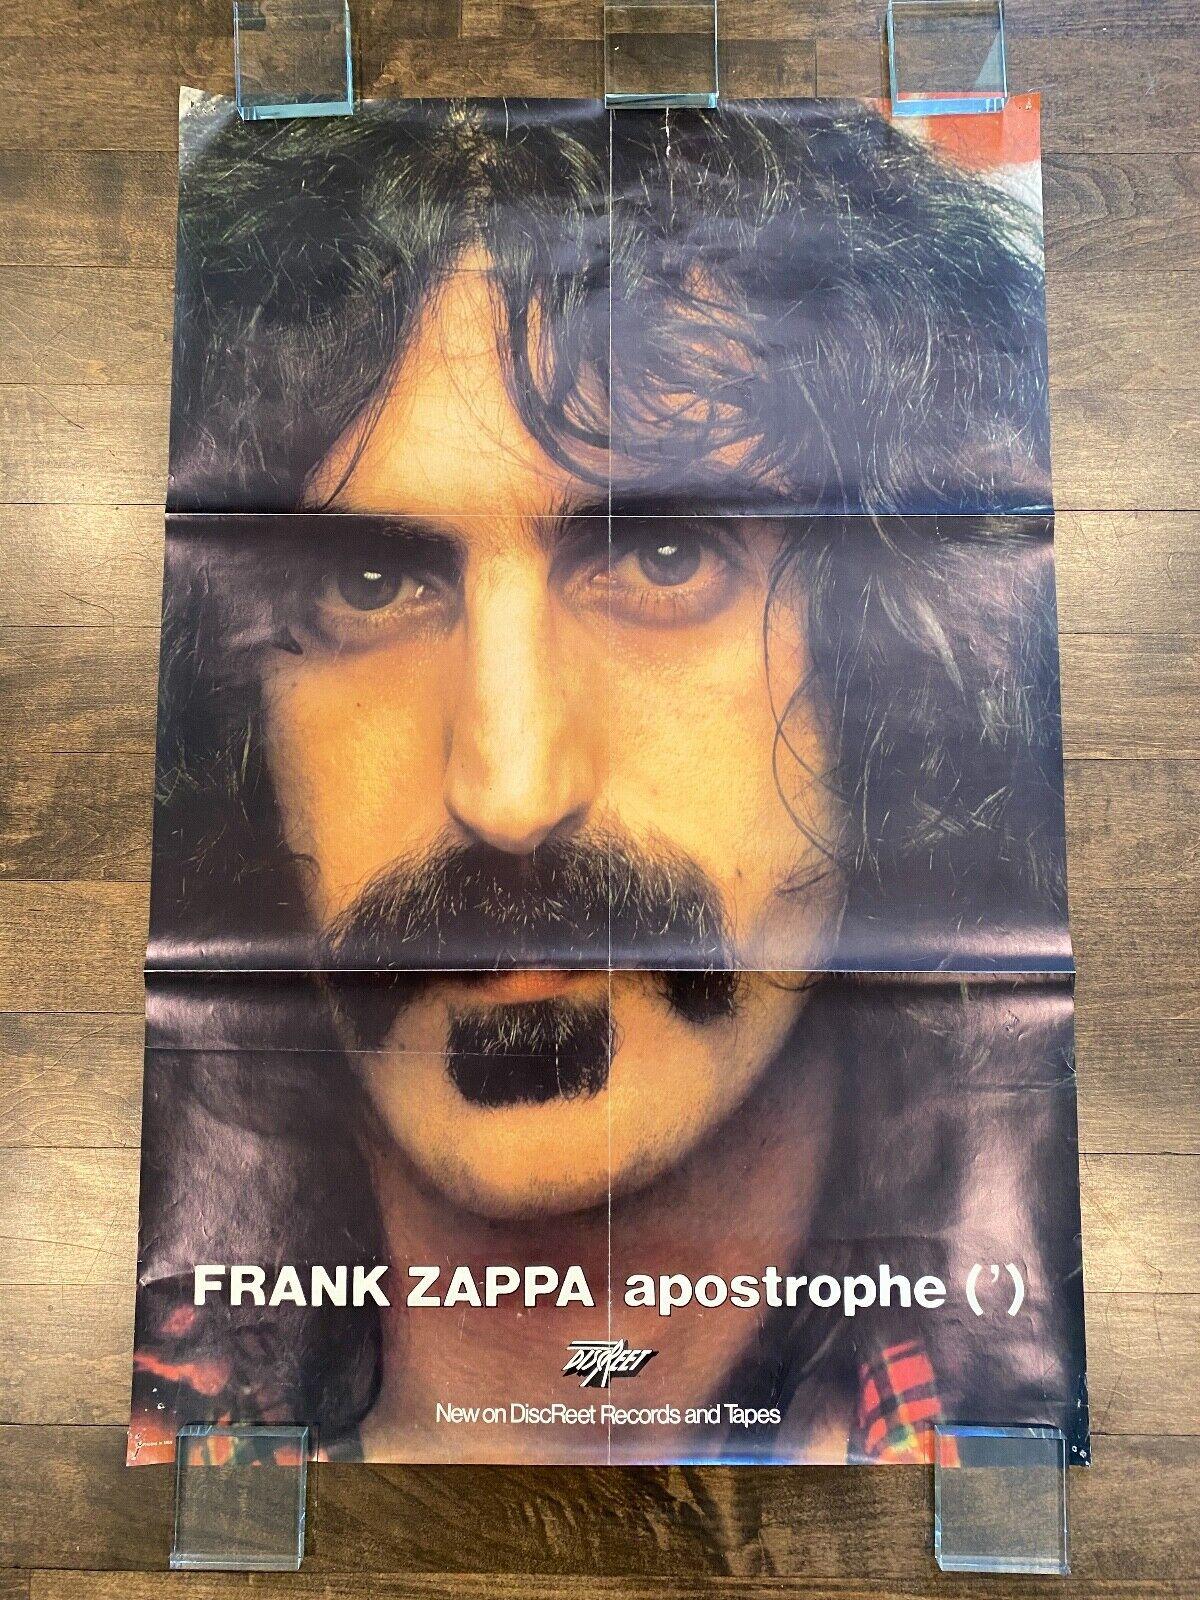 Frank Zappa Apostrophe 1974 Discreet Records Promo Poster - ULTRA RARE - $75.00